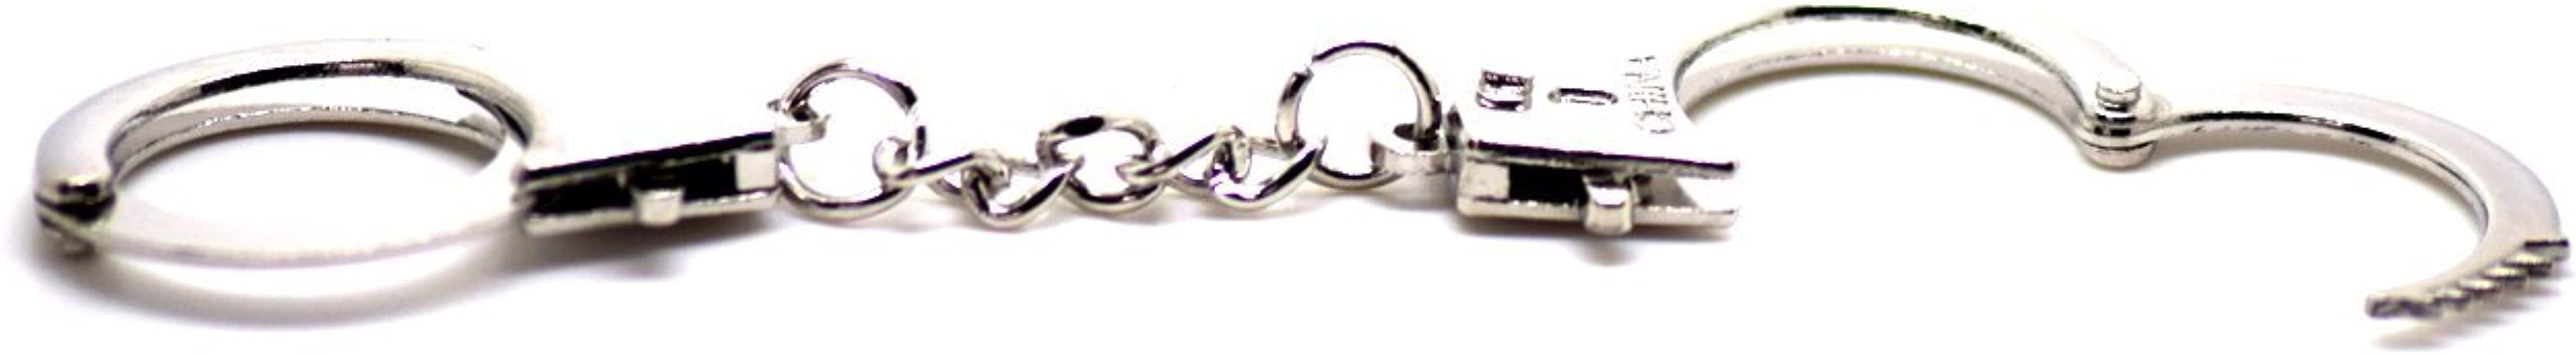 UltraByEasyPeasyStore Mens Mini Metal Handcuff shaped keychain keyrings